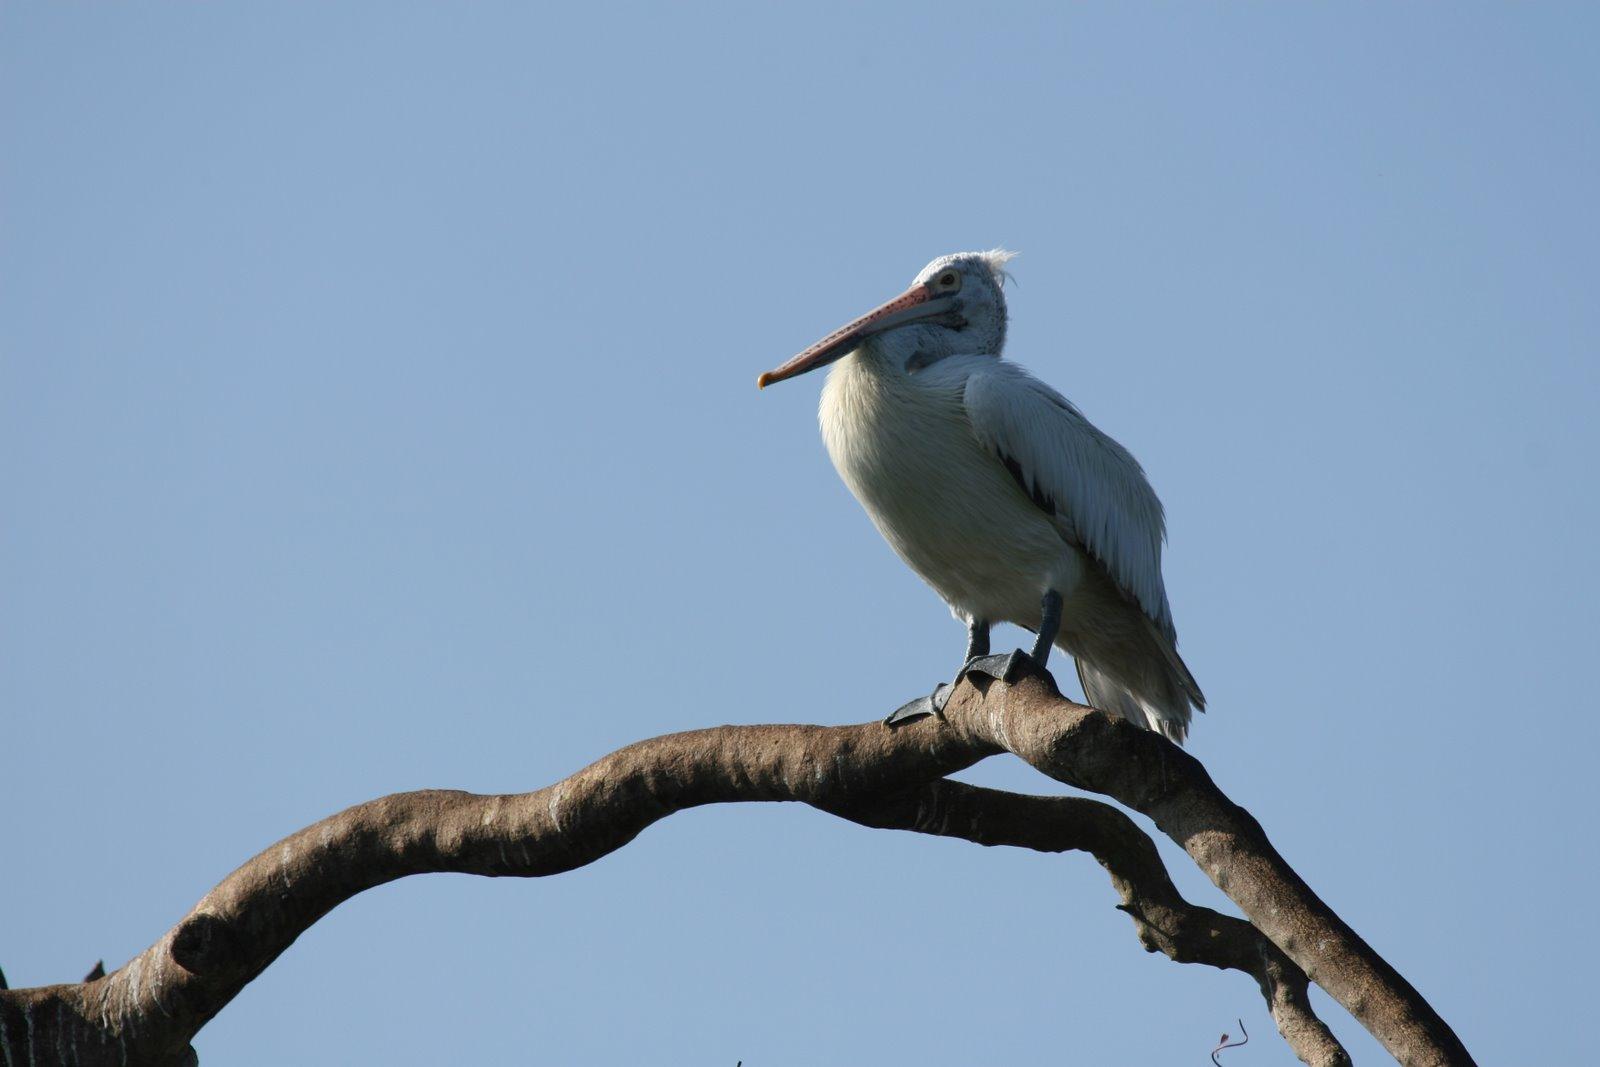 [spot-billed-pelican]